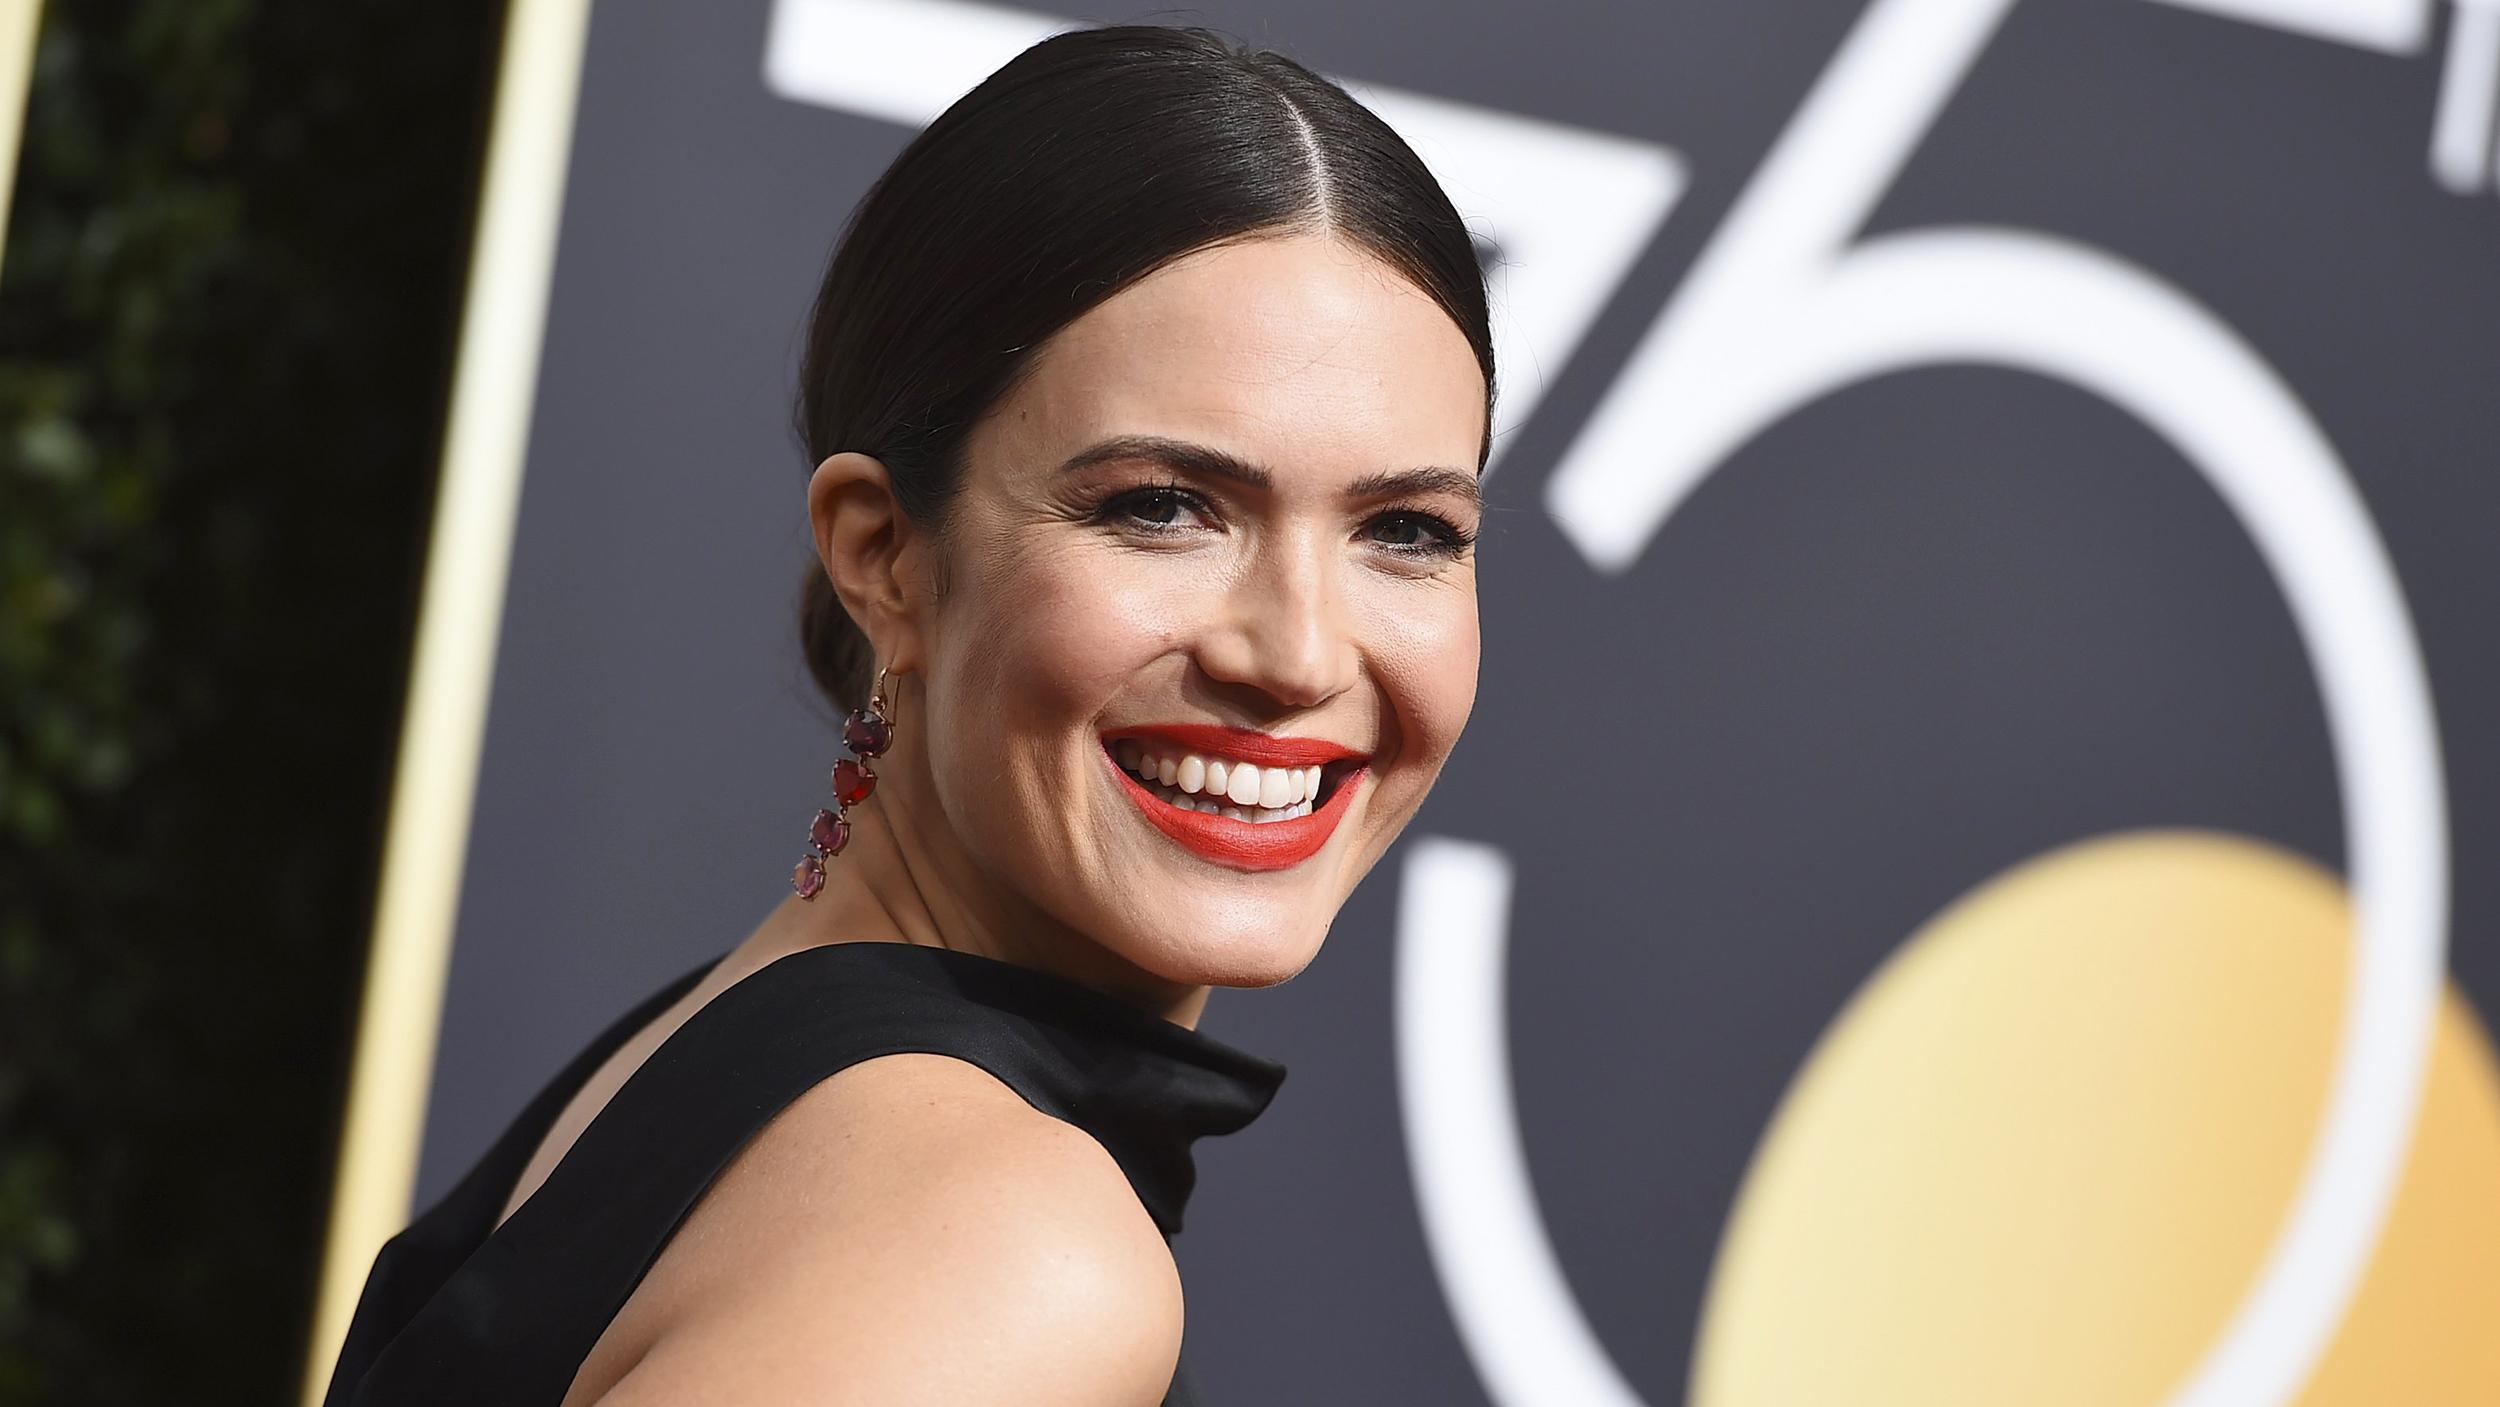 d851051e7 Golden Globes red carpet 2018: Black dresses at the awards show